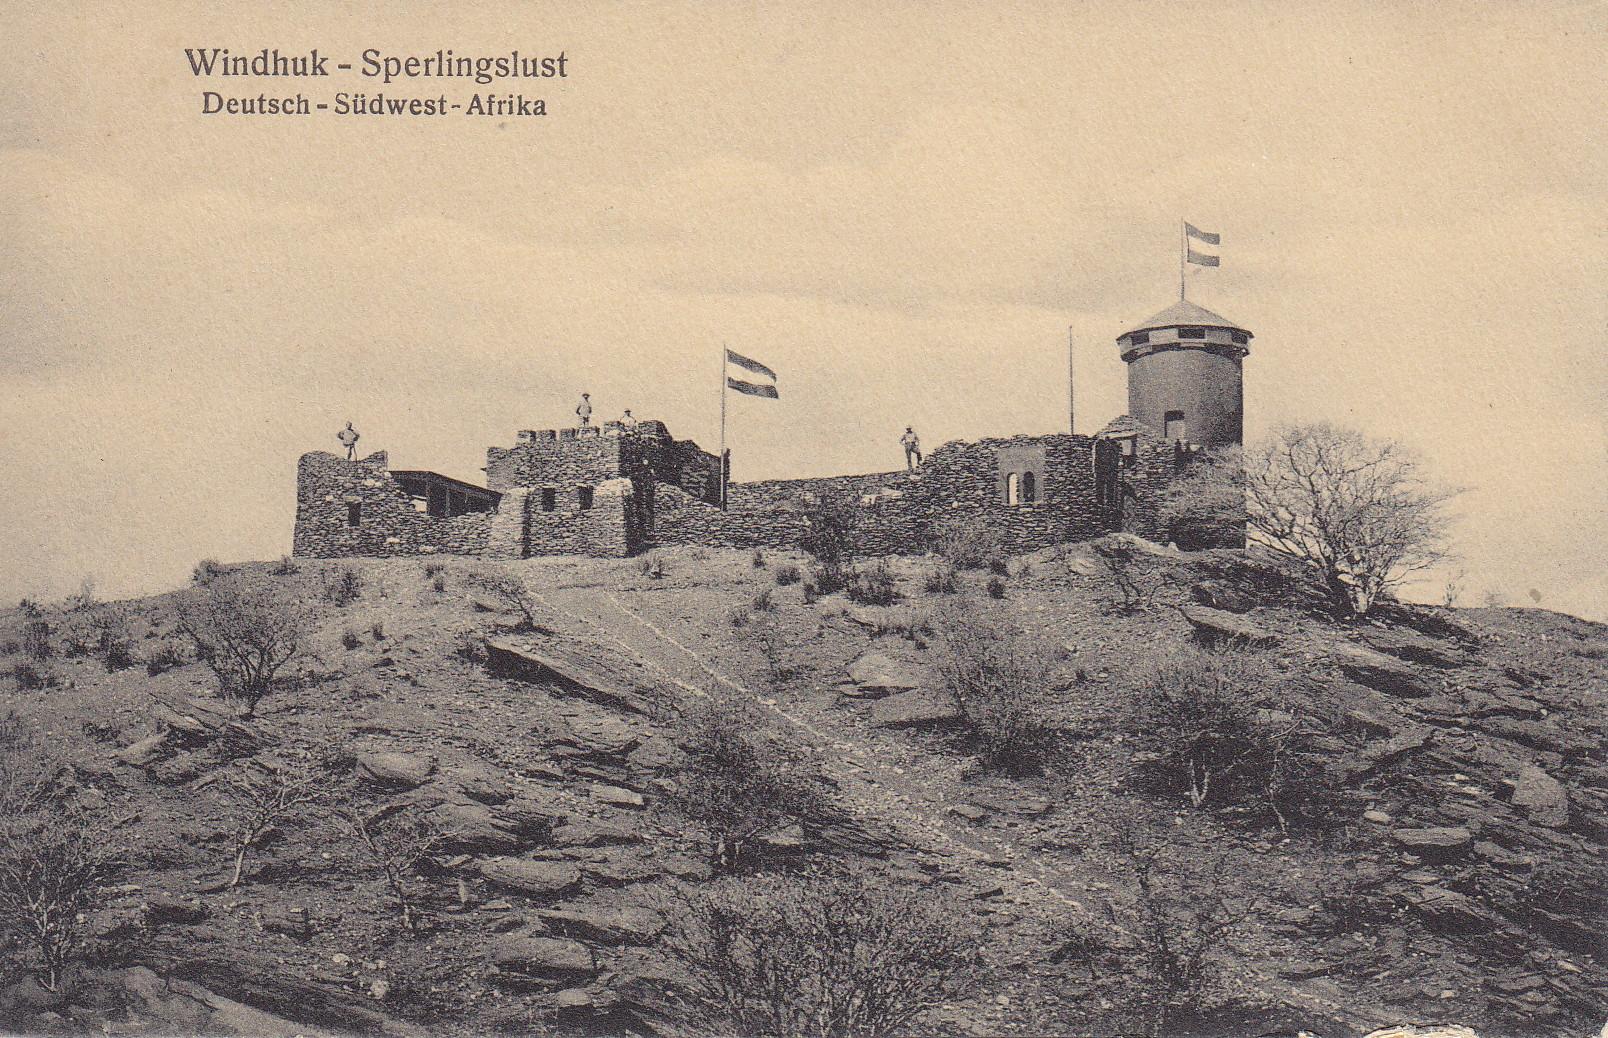 Windhuk - Sperlingslus